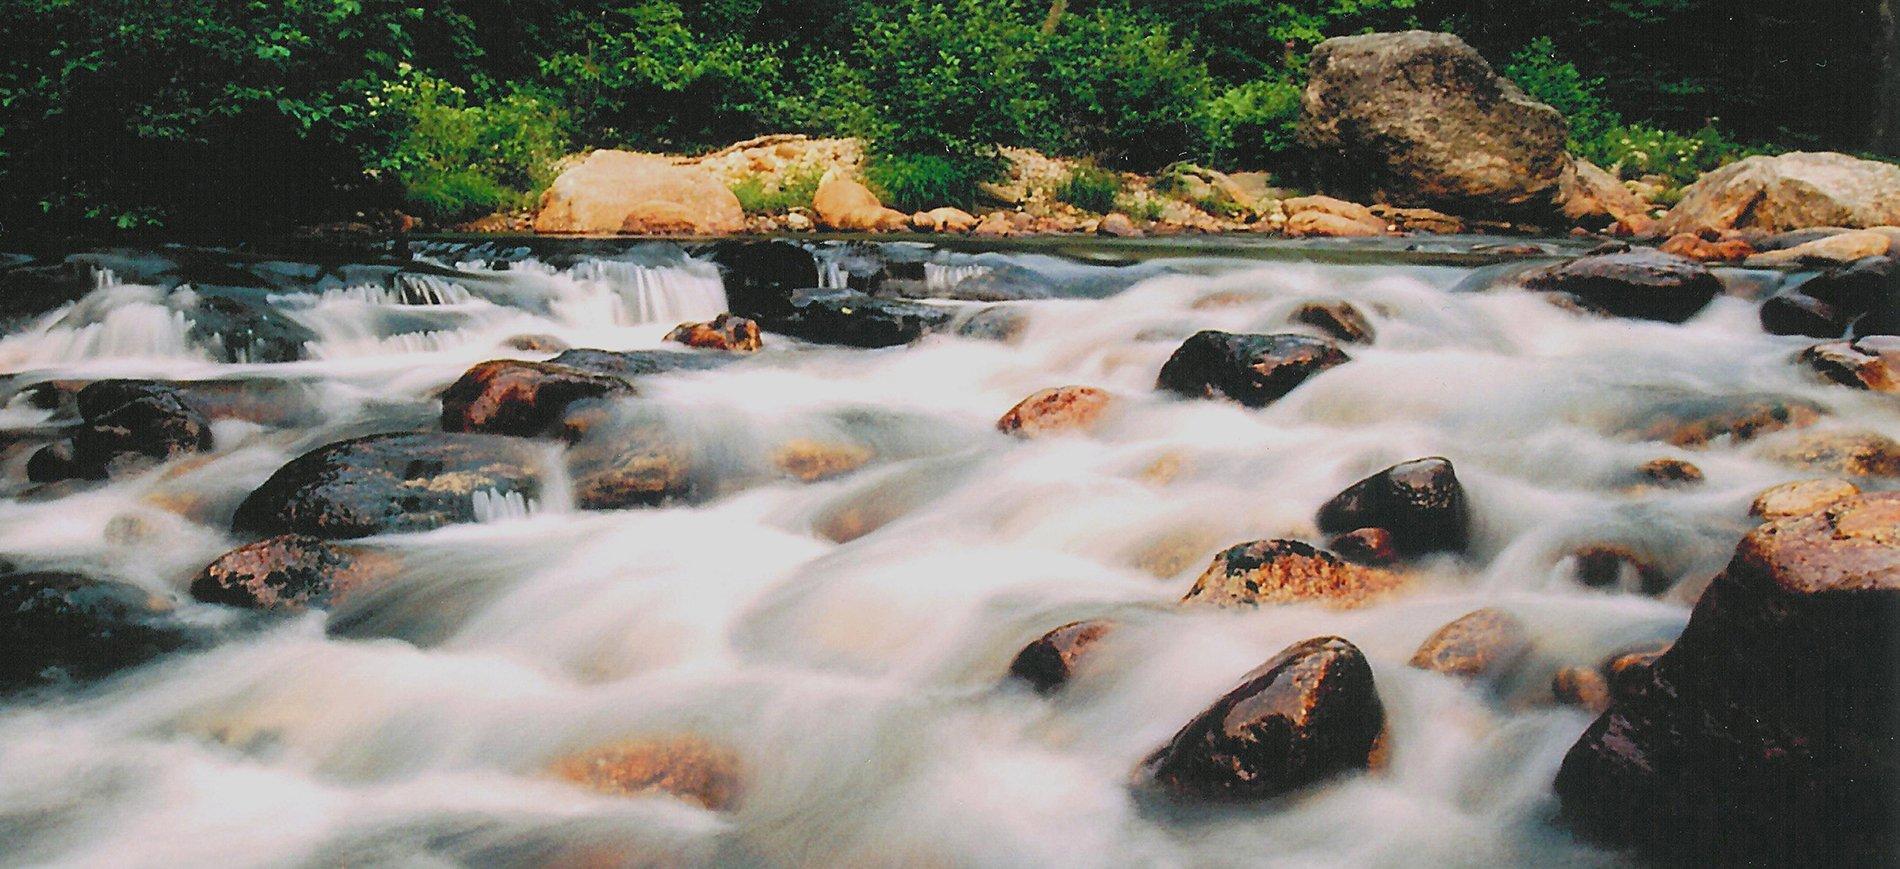 Ellis River rapids